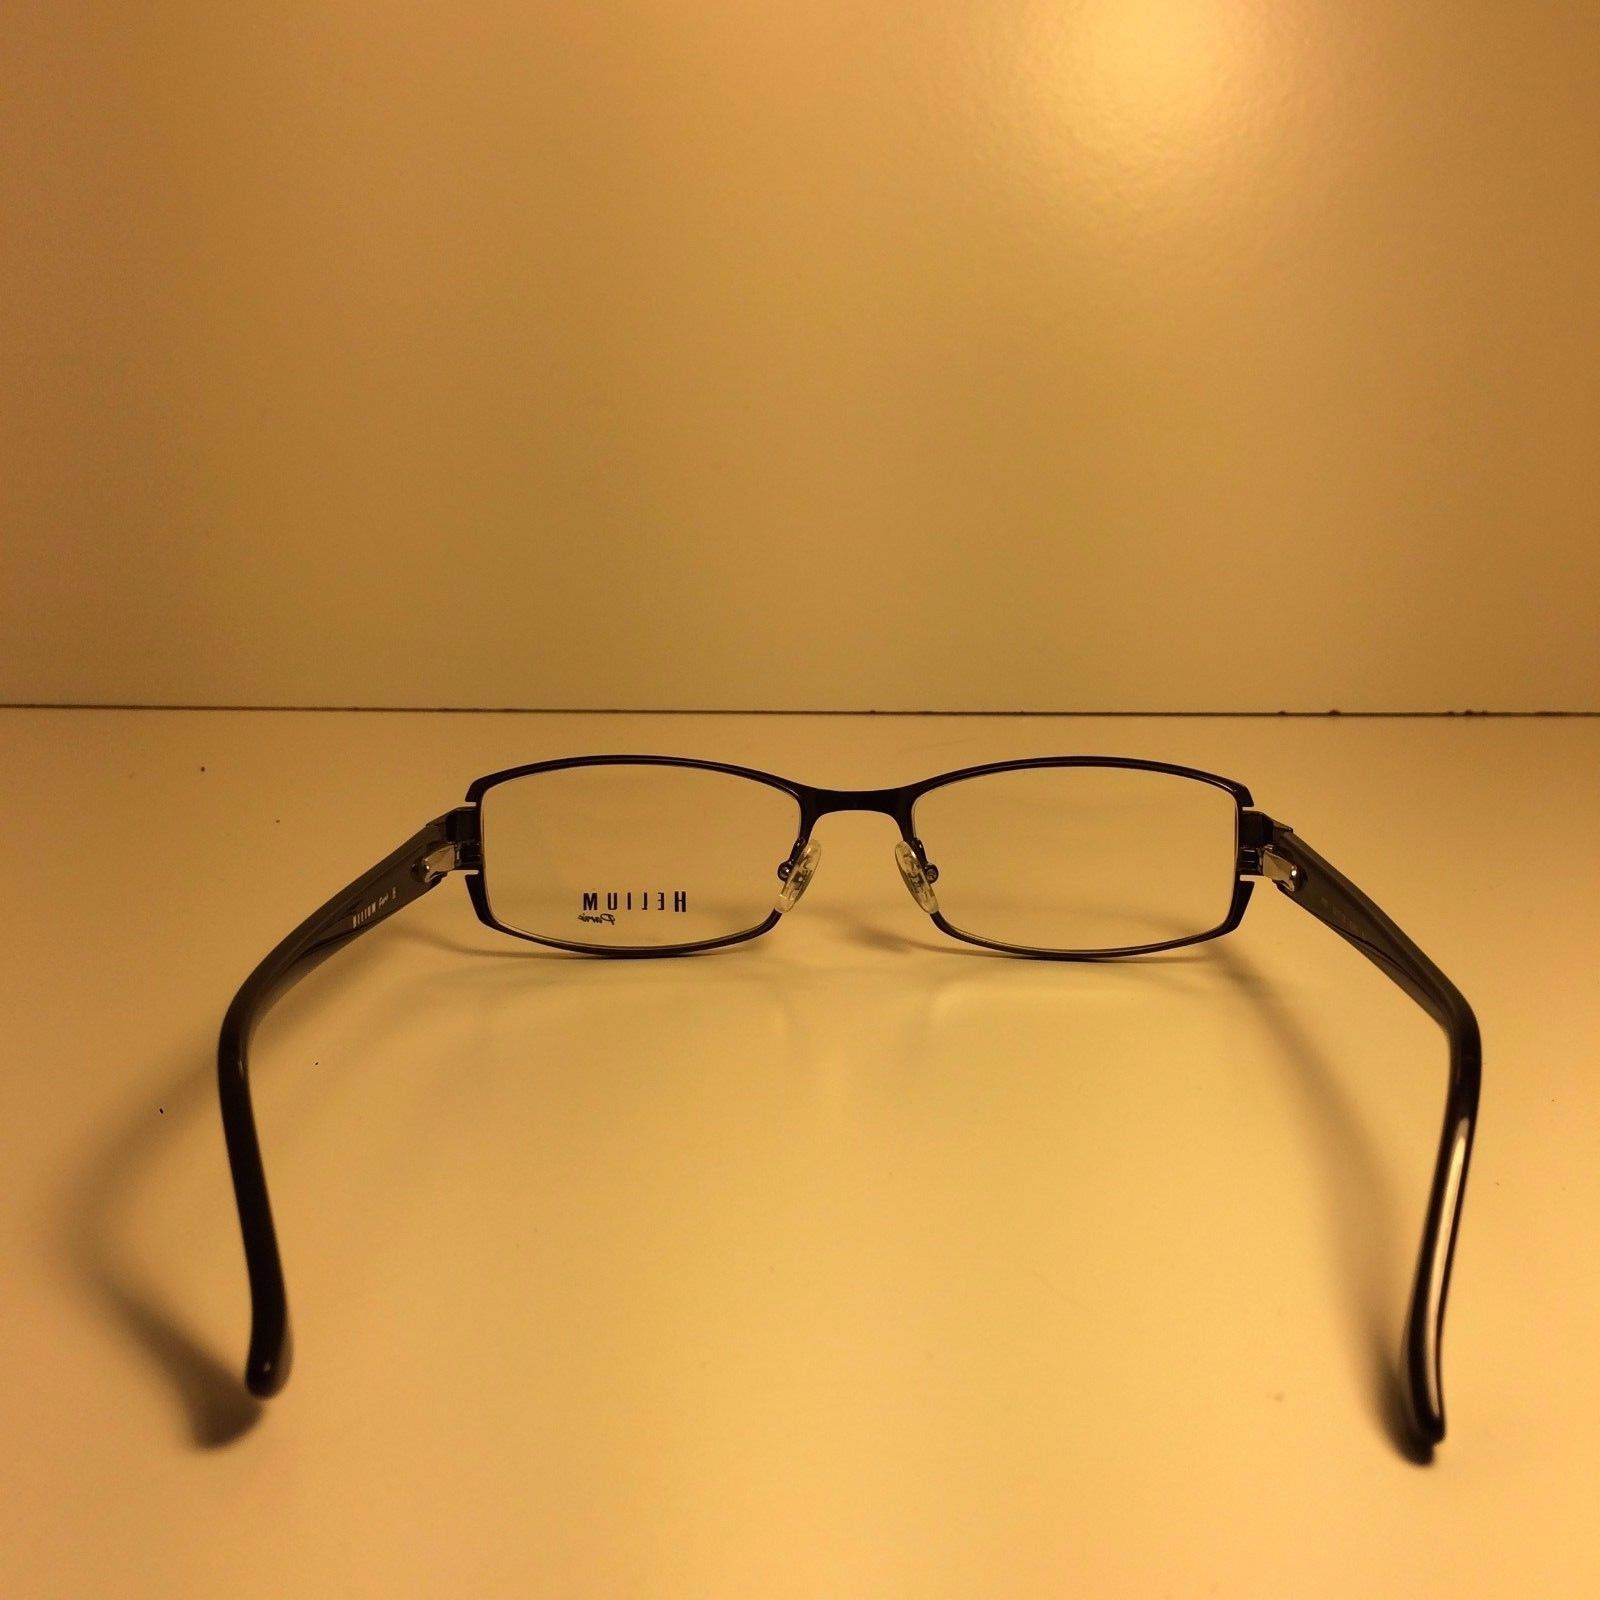 Eyeglass Frame By Size : Helium Paris 4190 Eyeglass Frames Size 52/17-135 Womens ...